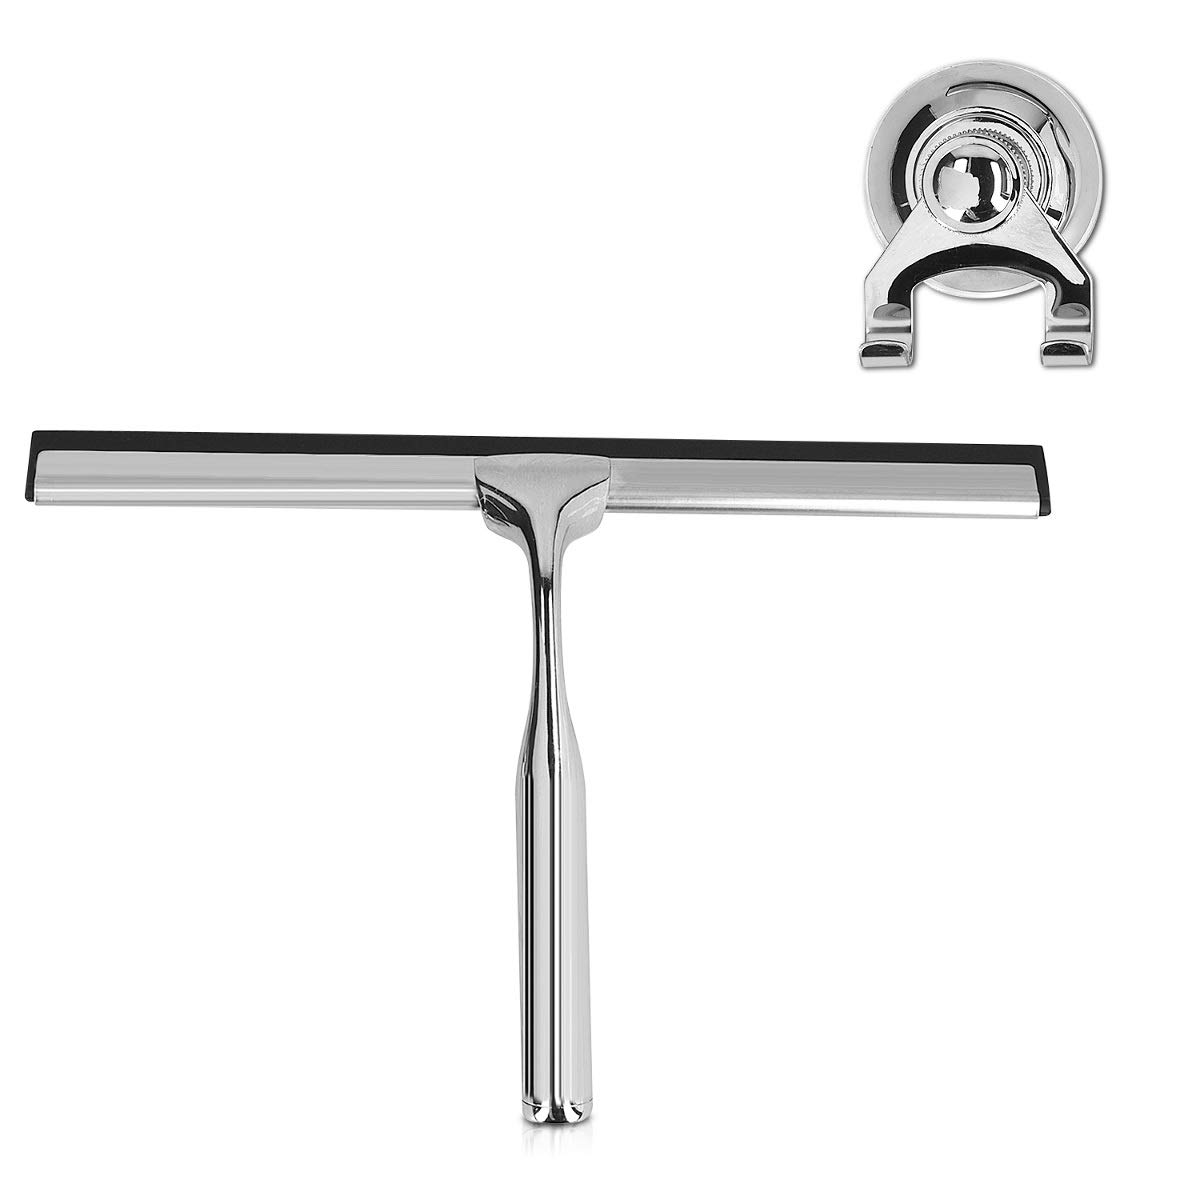 Navaris Shower Squeegee Window Cleaner - Stainless Steel Shower Door, Glass, Mirror, Wall, Bathroom Cleaner with Suction Cup Hook Holder - 10 Inch by Navaris